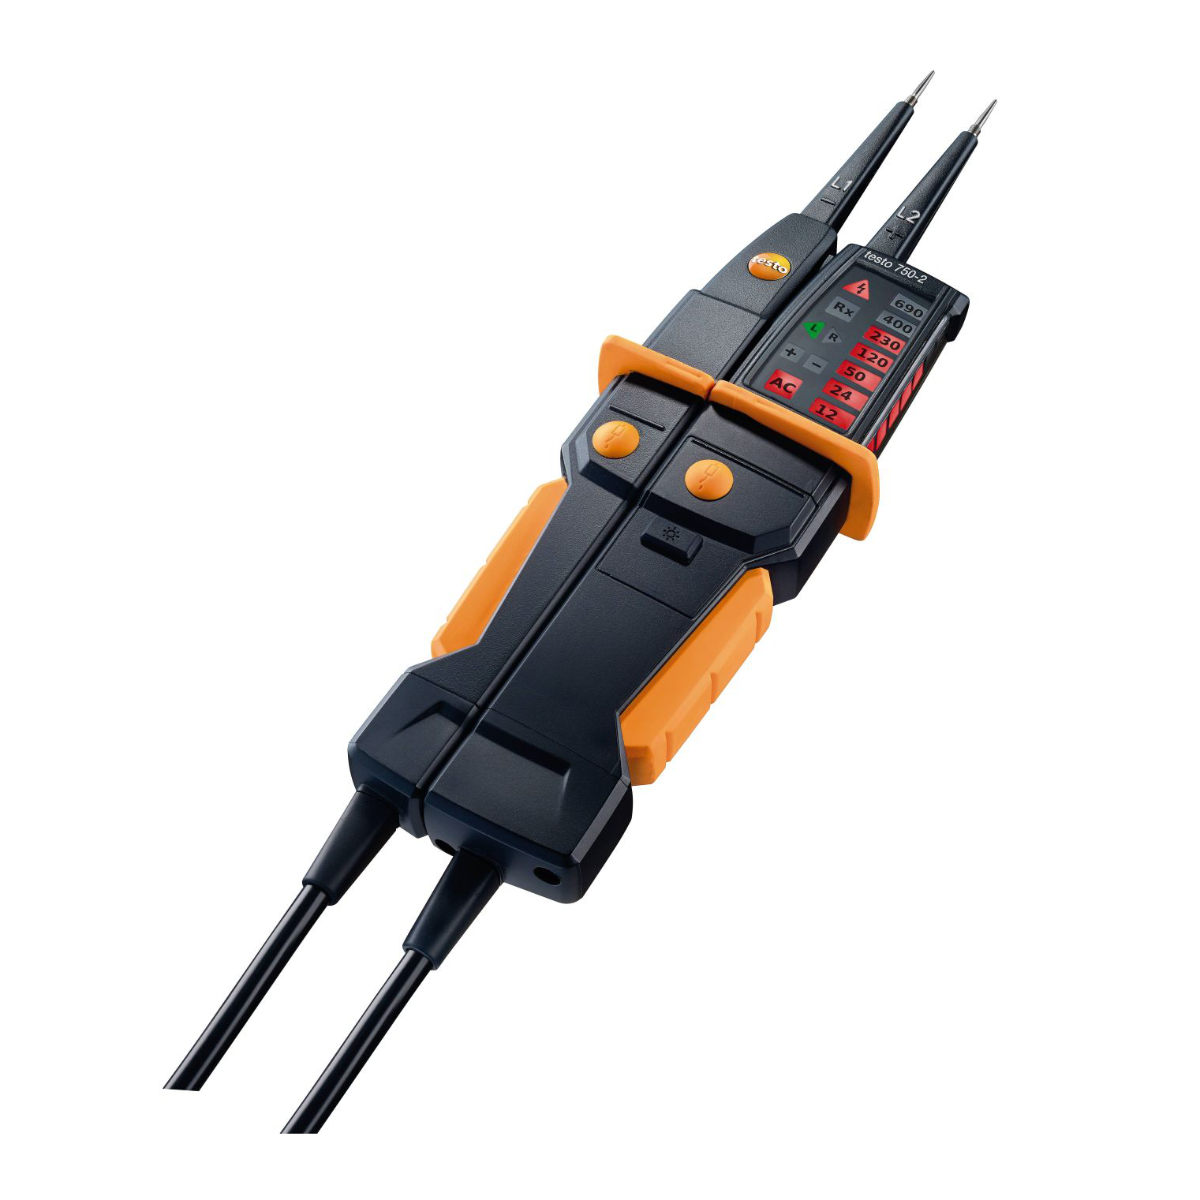 testo 750-2 | Voltage Tester